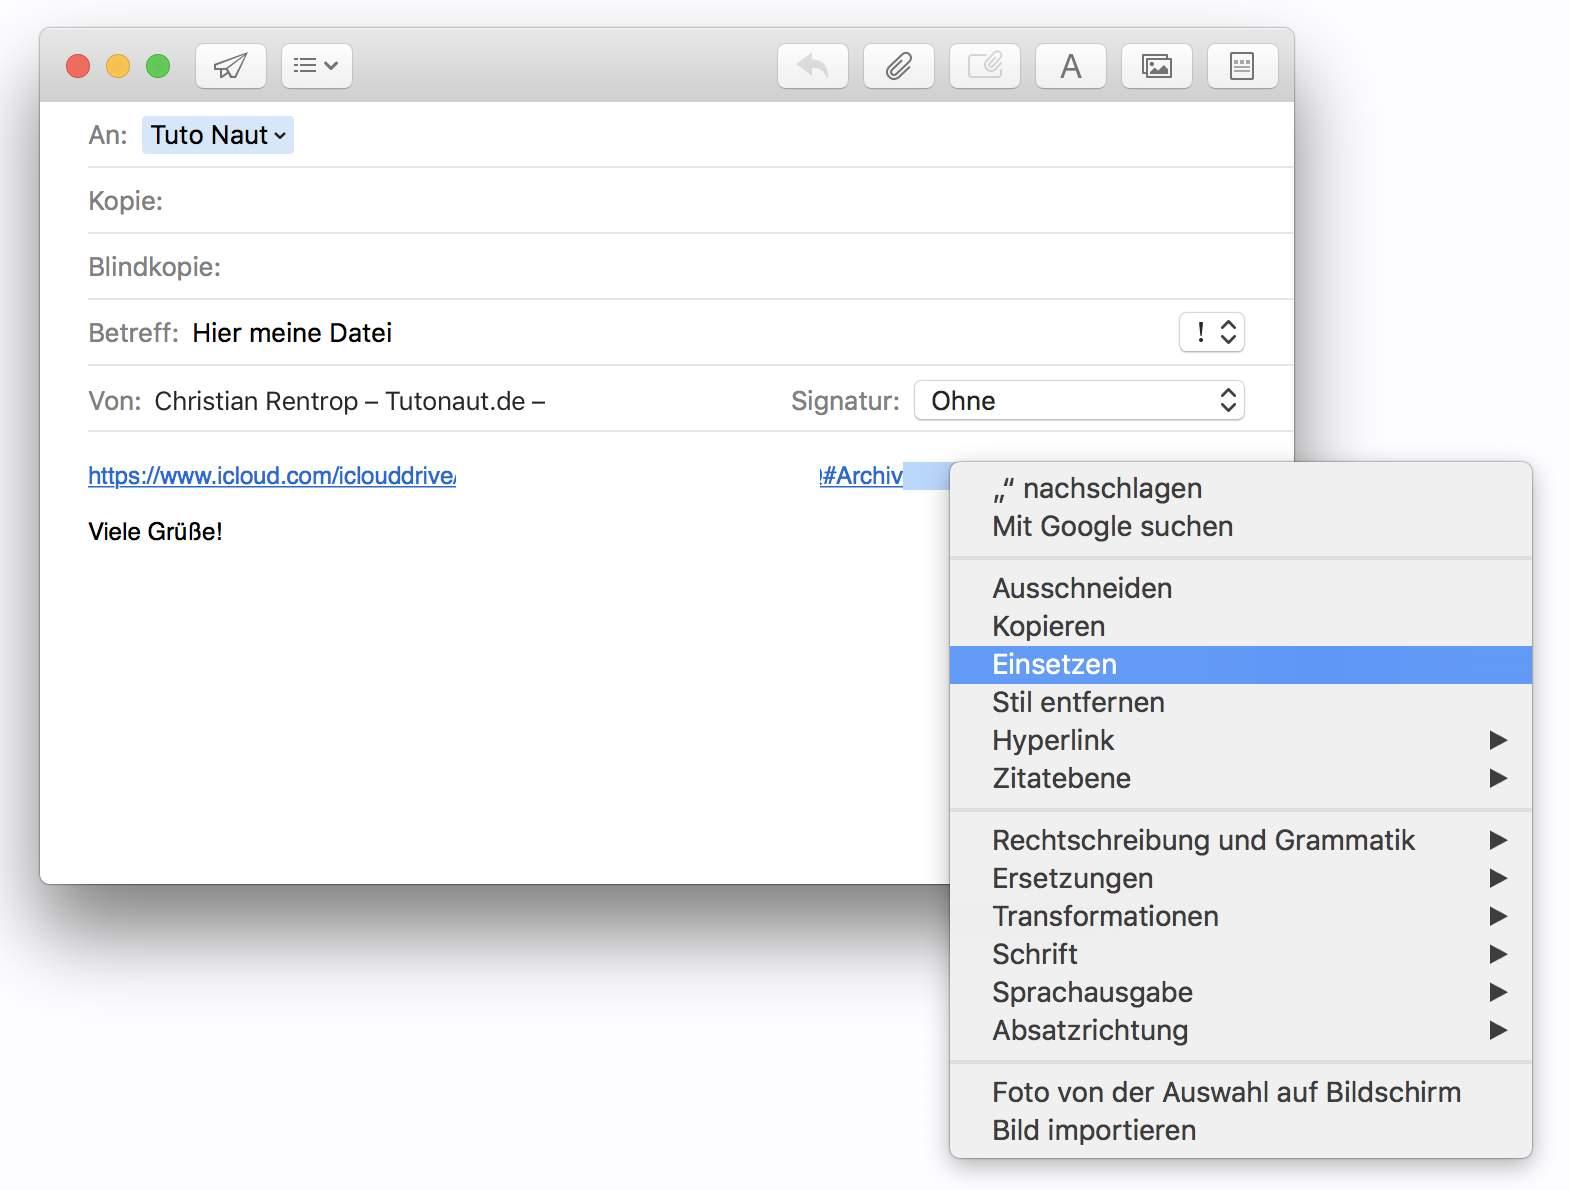 Ihr könnt den Download-Link jetzt verschicken  – egal ob per E-Mail oder Messenger.